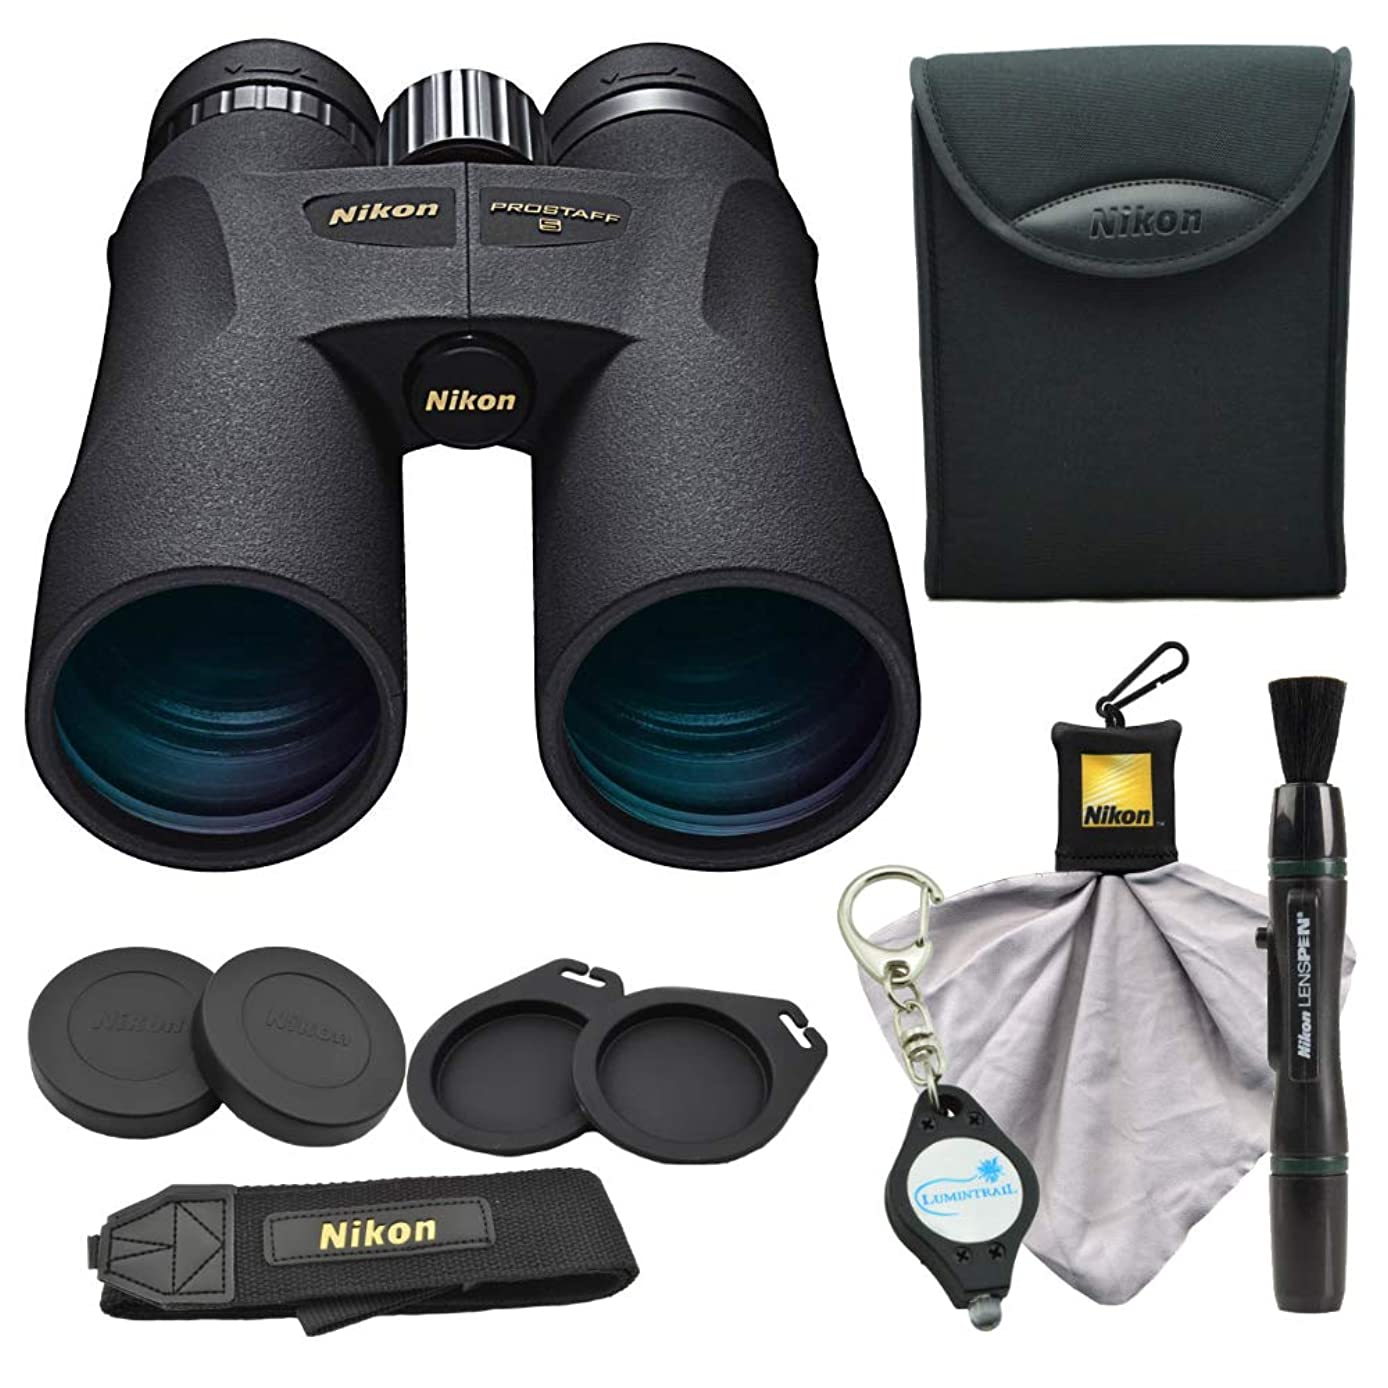 Nikon PROSTAFF 5 12X50 Binoculars (7573), Black Bundle with a Nikon Lens Pen, Micro Fiber Cleaning Cloth and Lumintrail Keychain Light